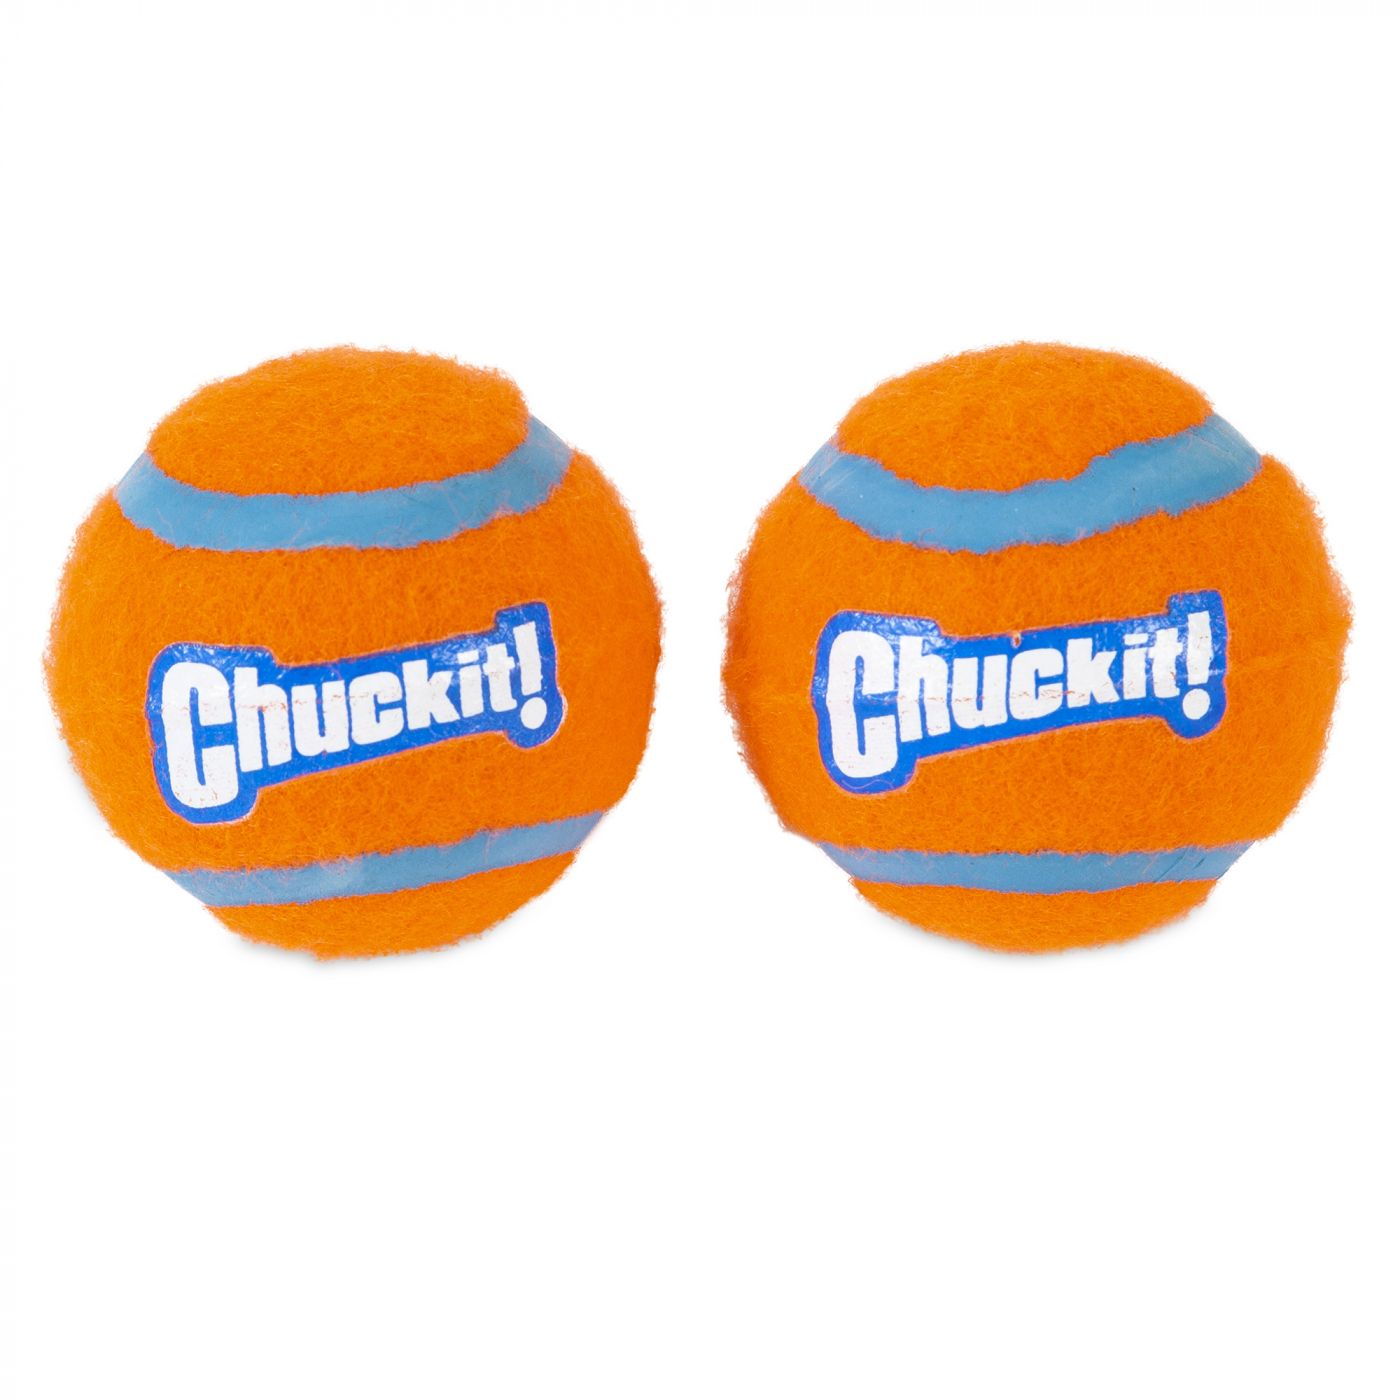 CHUCKIT TENNIS BALL